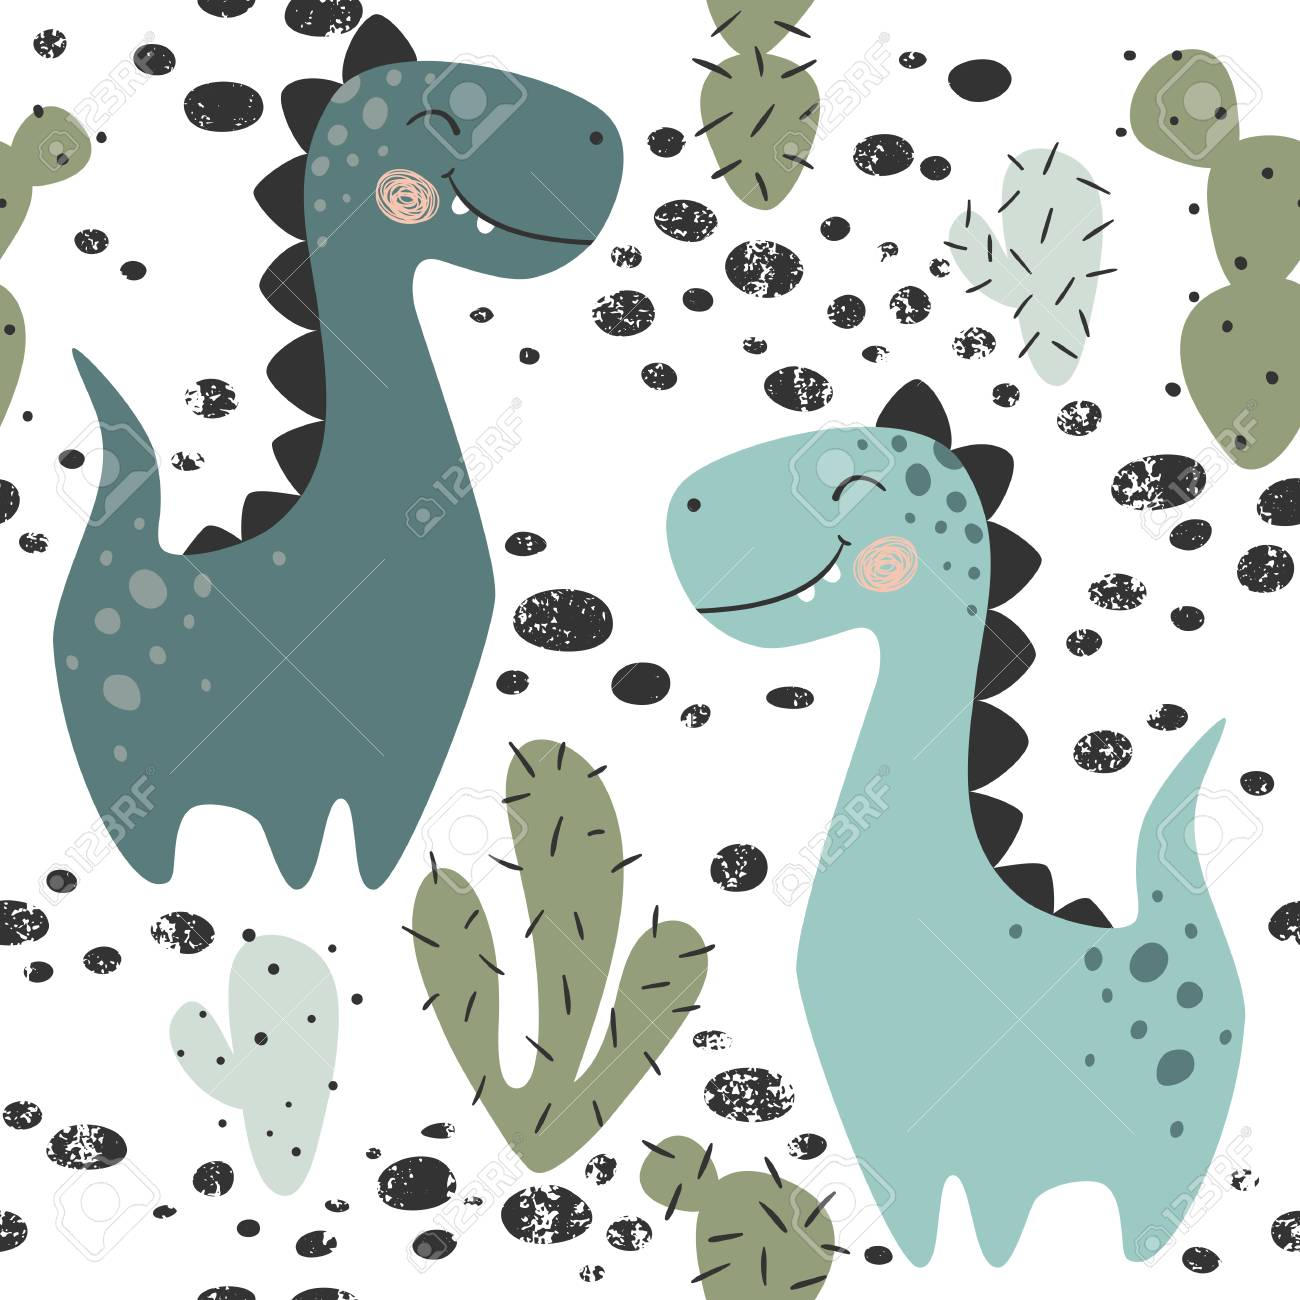 Dinosaur baby boy seamless pattern. Sweet dino with cactus. Scandinavian cute print. Cool brachiosaurus, illustration for nursery t-shirt, kids apparel, invitation cover, simple child background design - 110112864